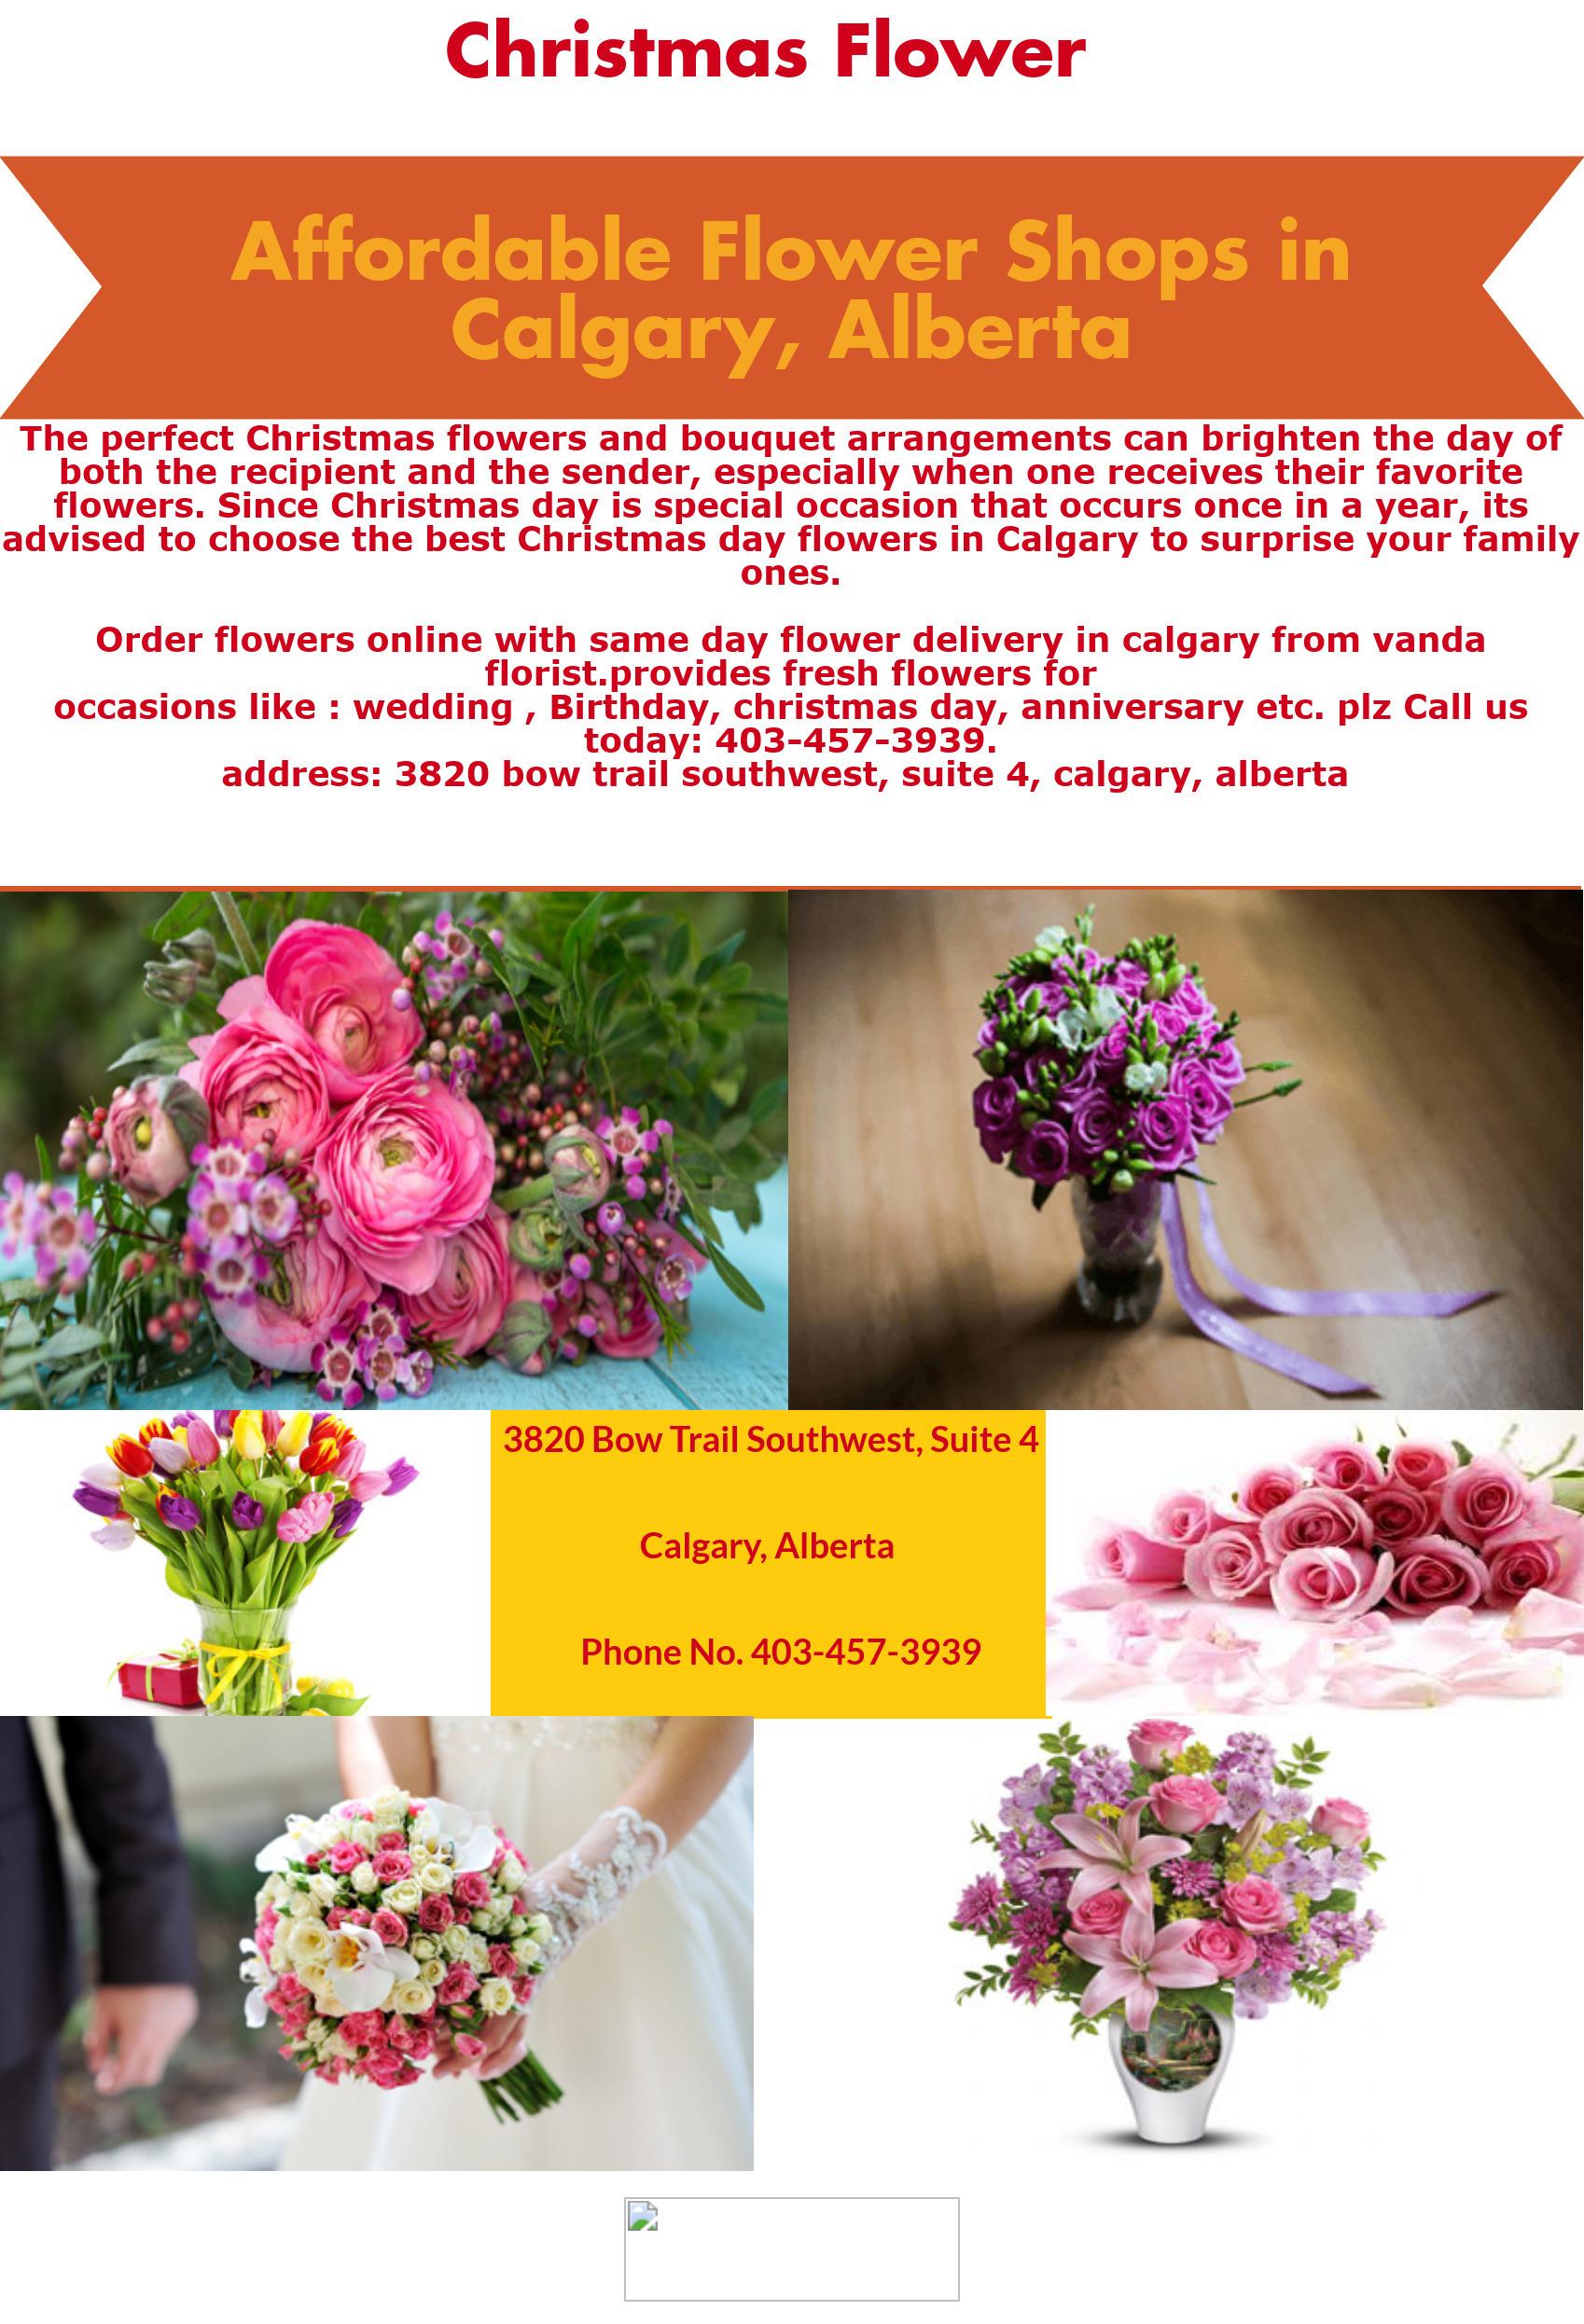 Best flowers for a birthday gallery flower wallpaper hd affordable flower shops in calgary alberta nb affordable flower shops in calgary alberta nb izmirmasajfo izmirmasajfo